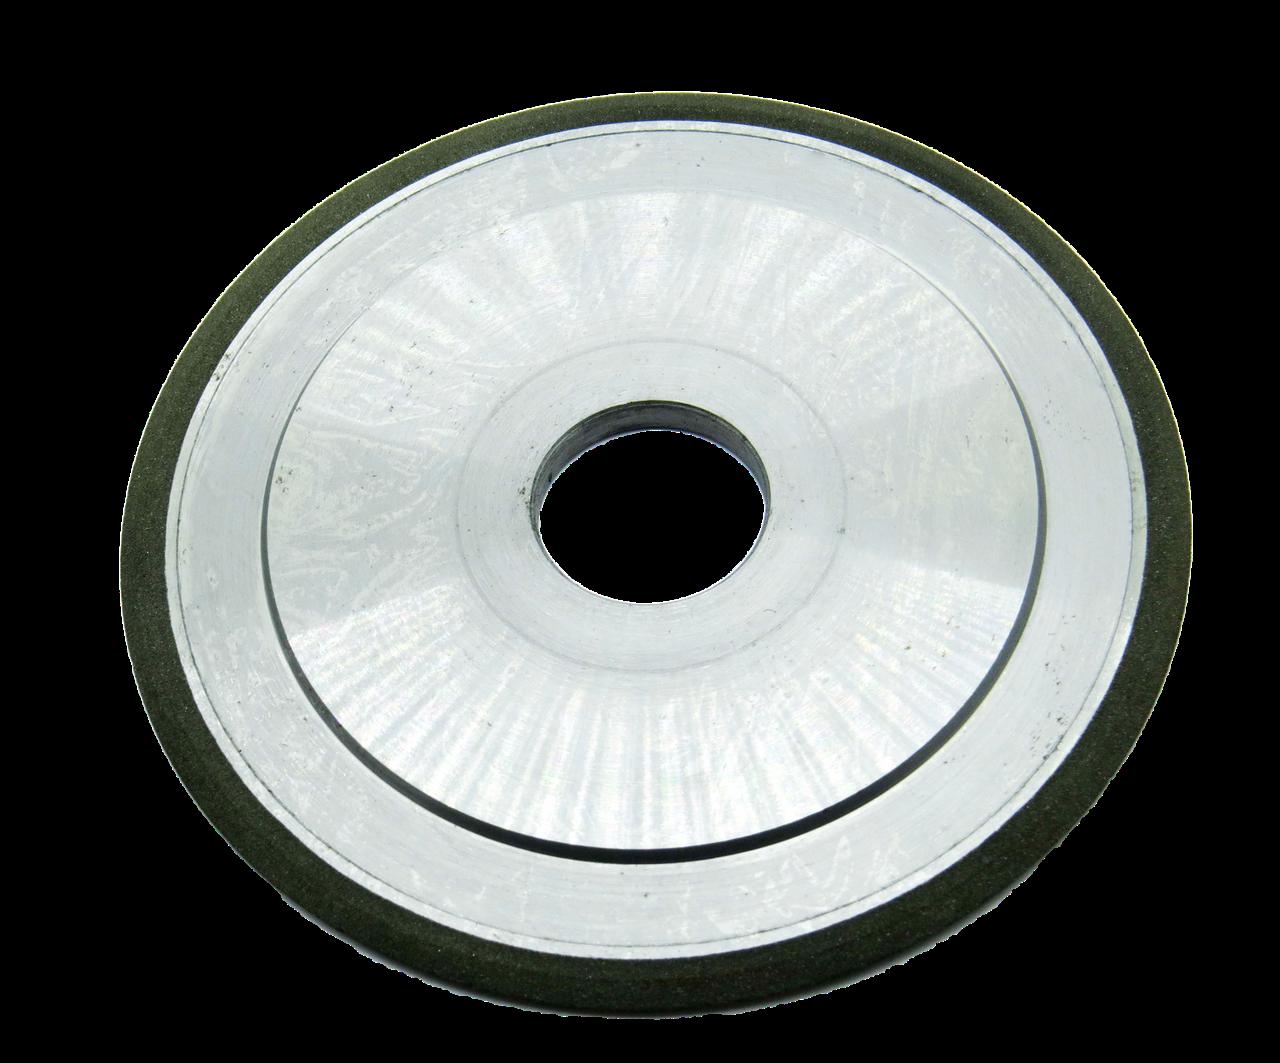 Круг алмазный заточной 14ЕЕ1 125х6х3х5х45х32 160/125 АС4 В2-01 БАЗИС шлифовальный